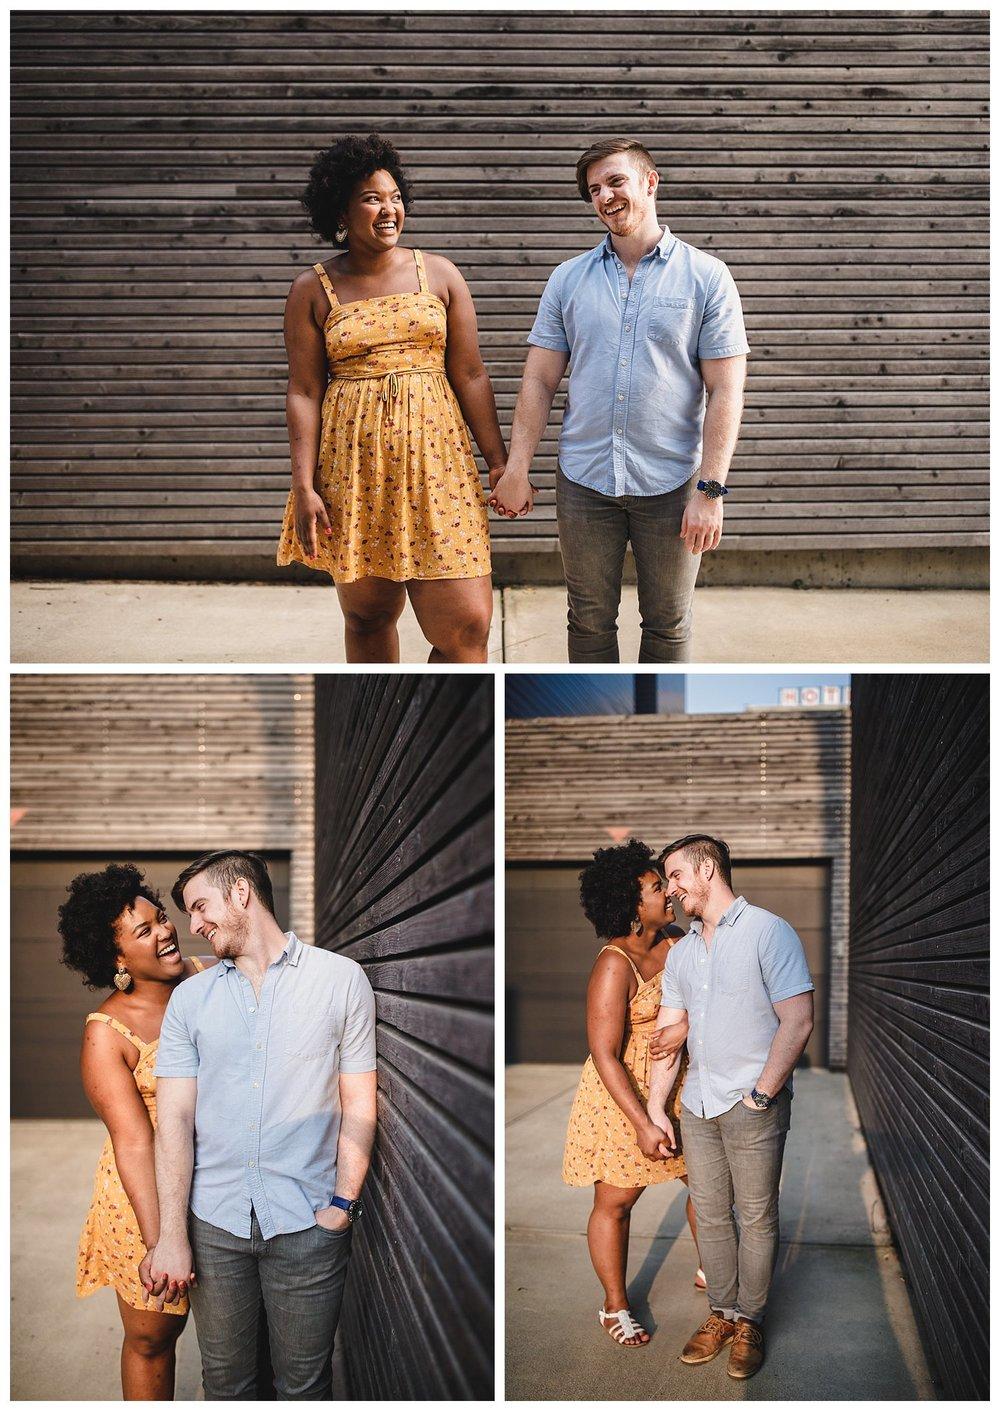 Kelsey_Diane_Photography_Kansas_City_Engagement_Wedding_Photographer_Midwest_Traveling_Missouri_Bri_Tyler_Arcade_Engagement_Up_Down_Kansas_City_Crossroads_District_0792.jpg